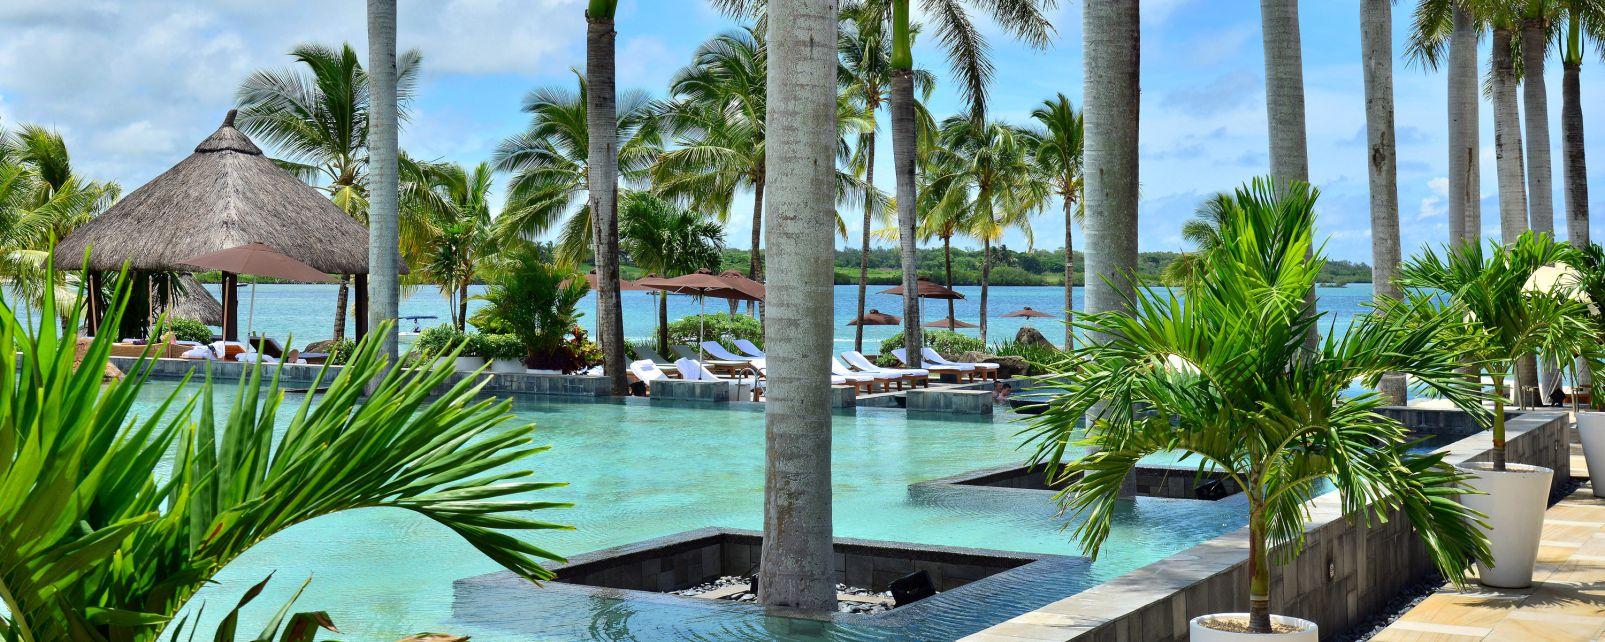 Hôtel Four Seasons Mauritius at Anahita